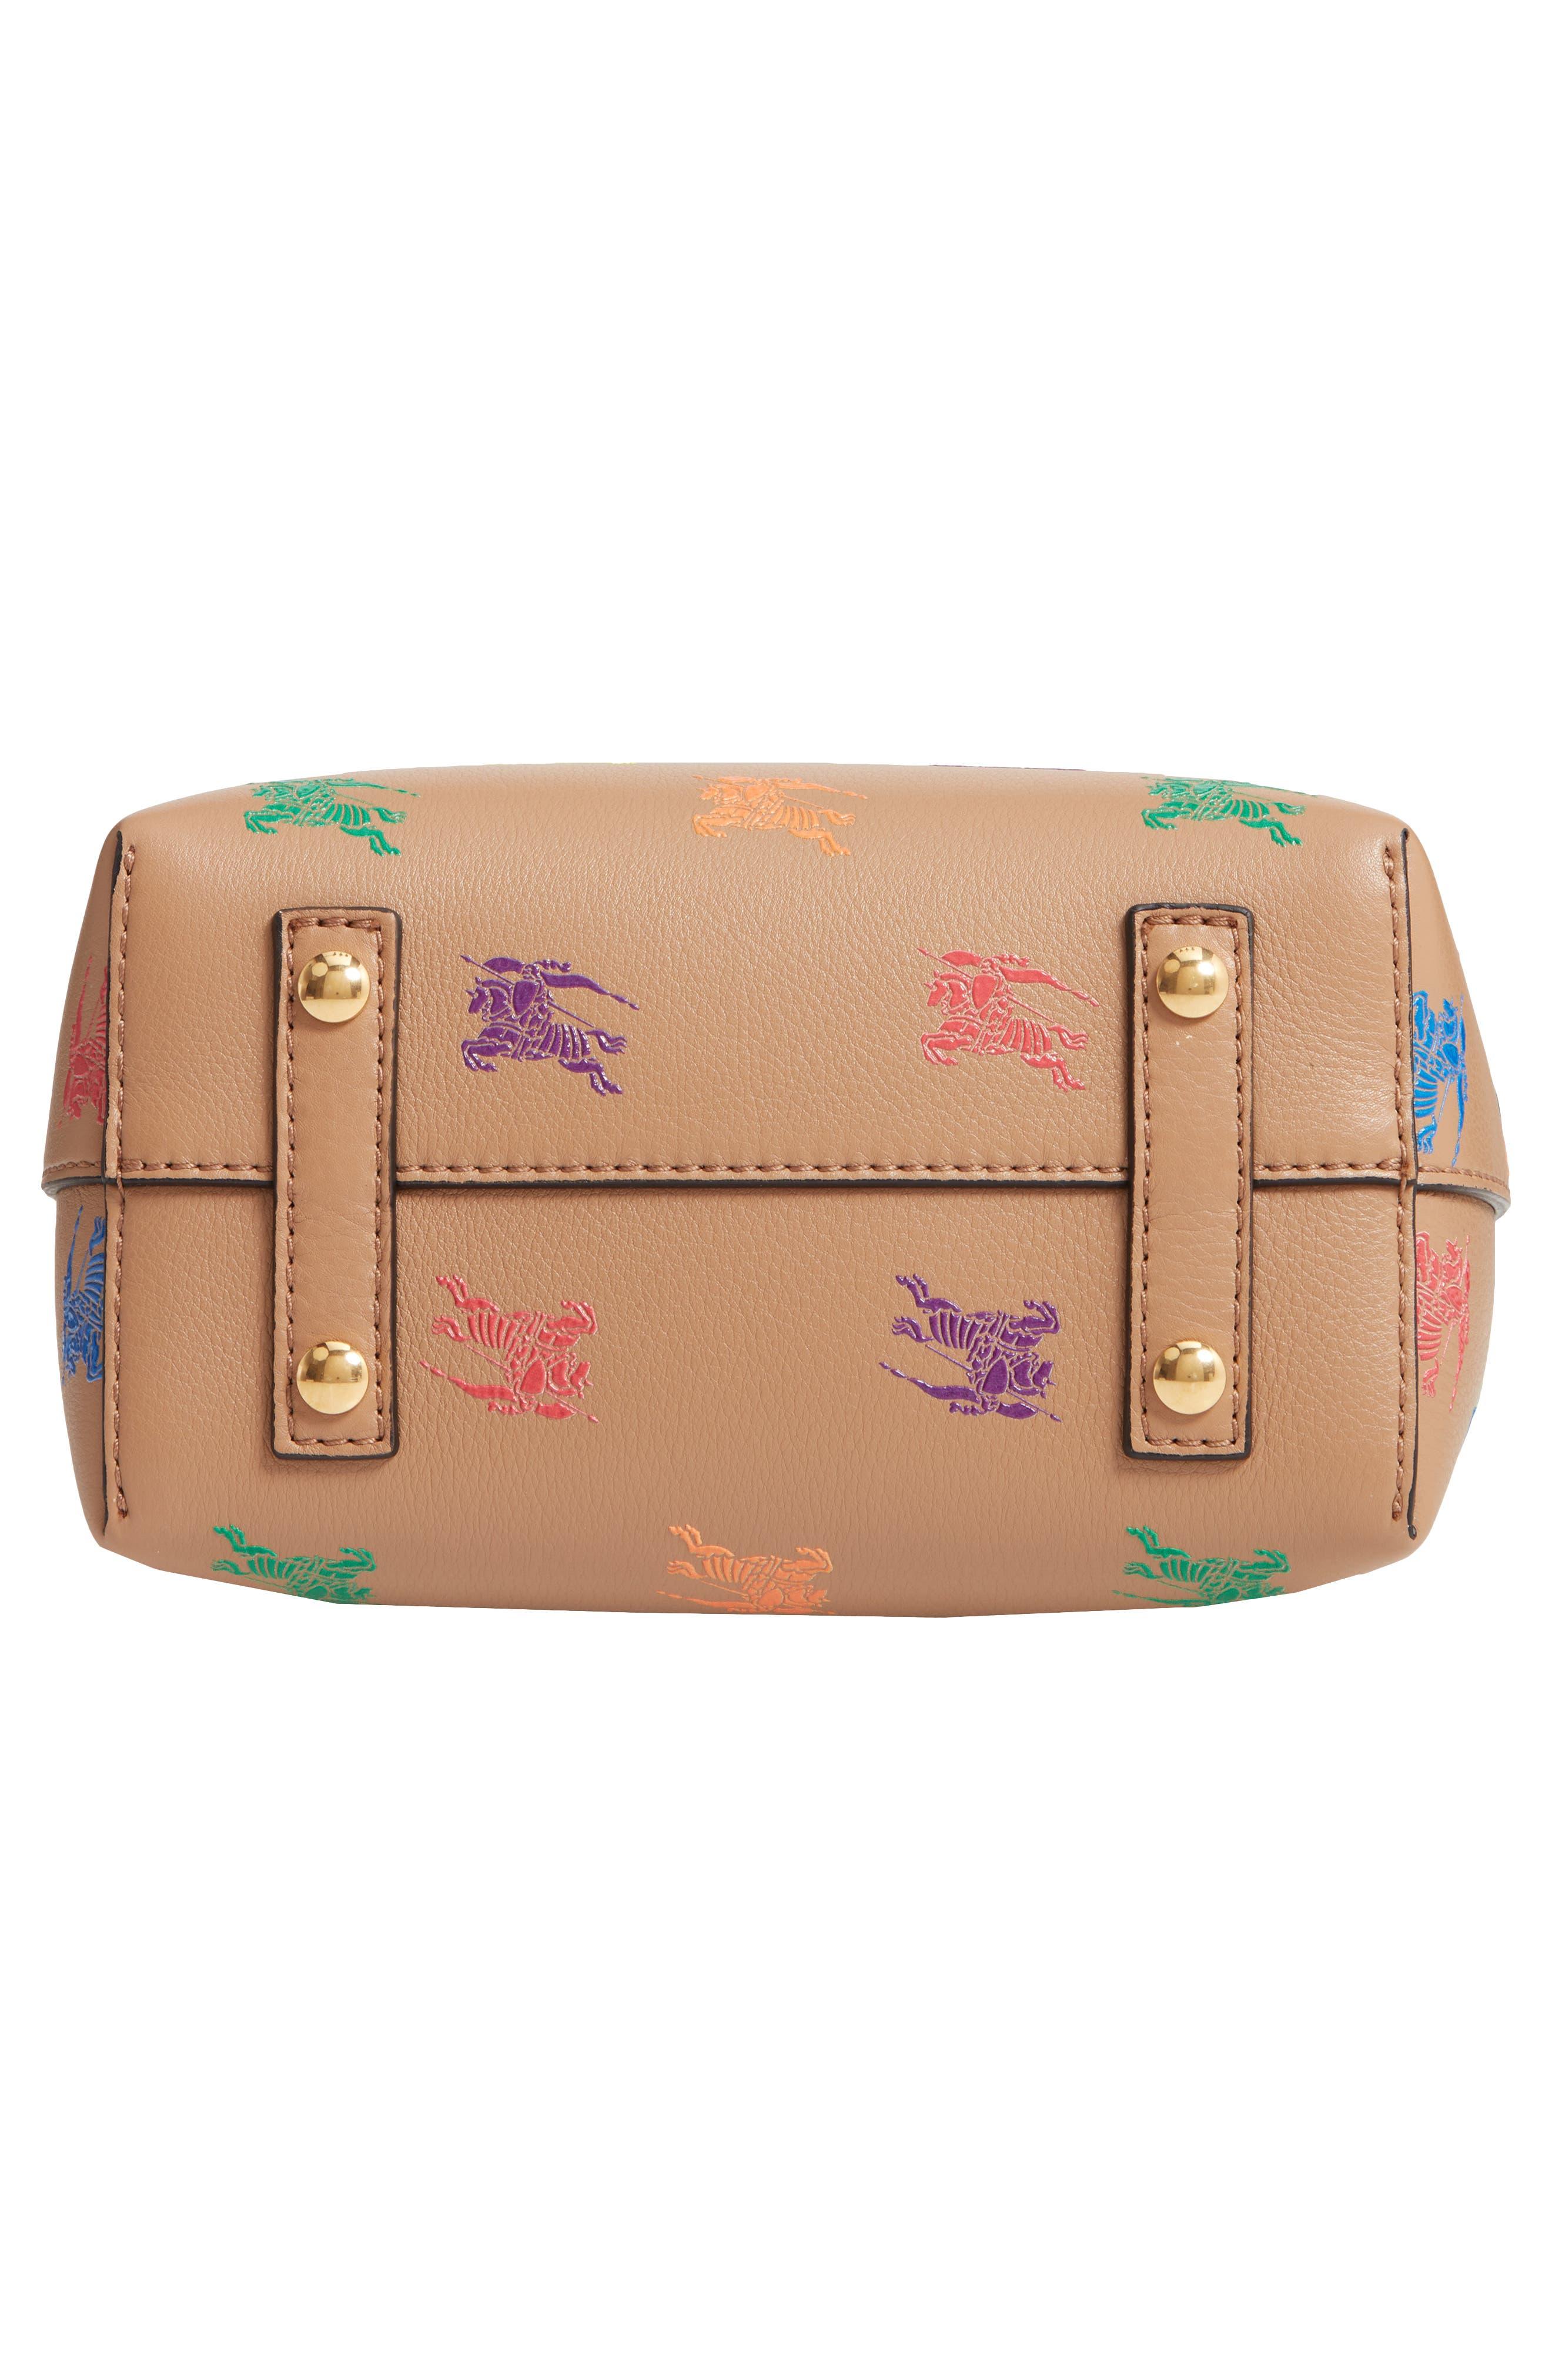 Baby Belt Bag Rainbow Logo Leather Tote,                             Alternate thumbnail 6, color,                             LIGHT CAMEL